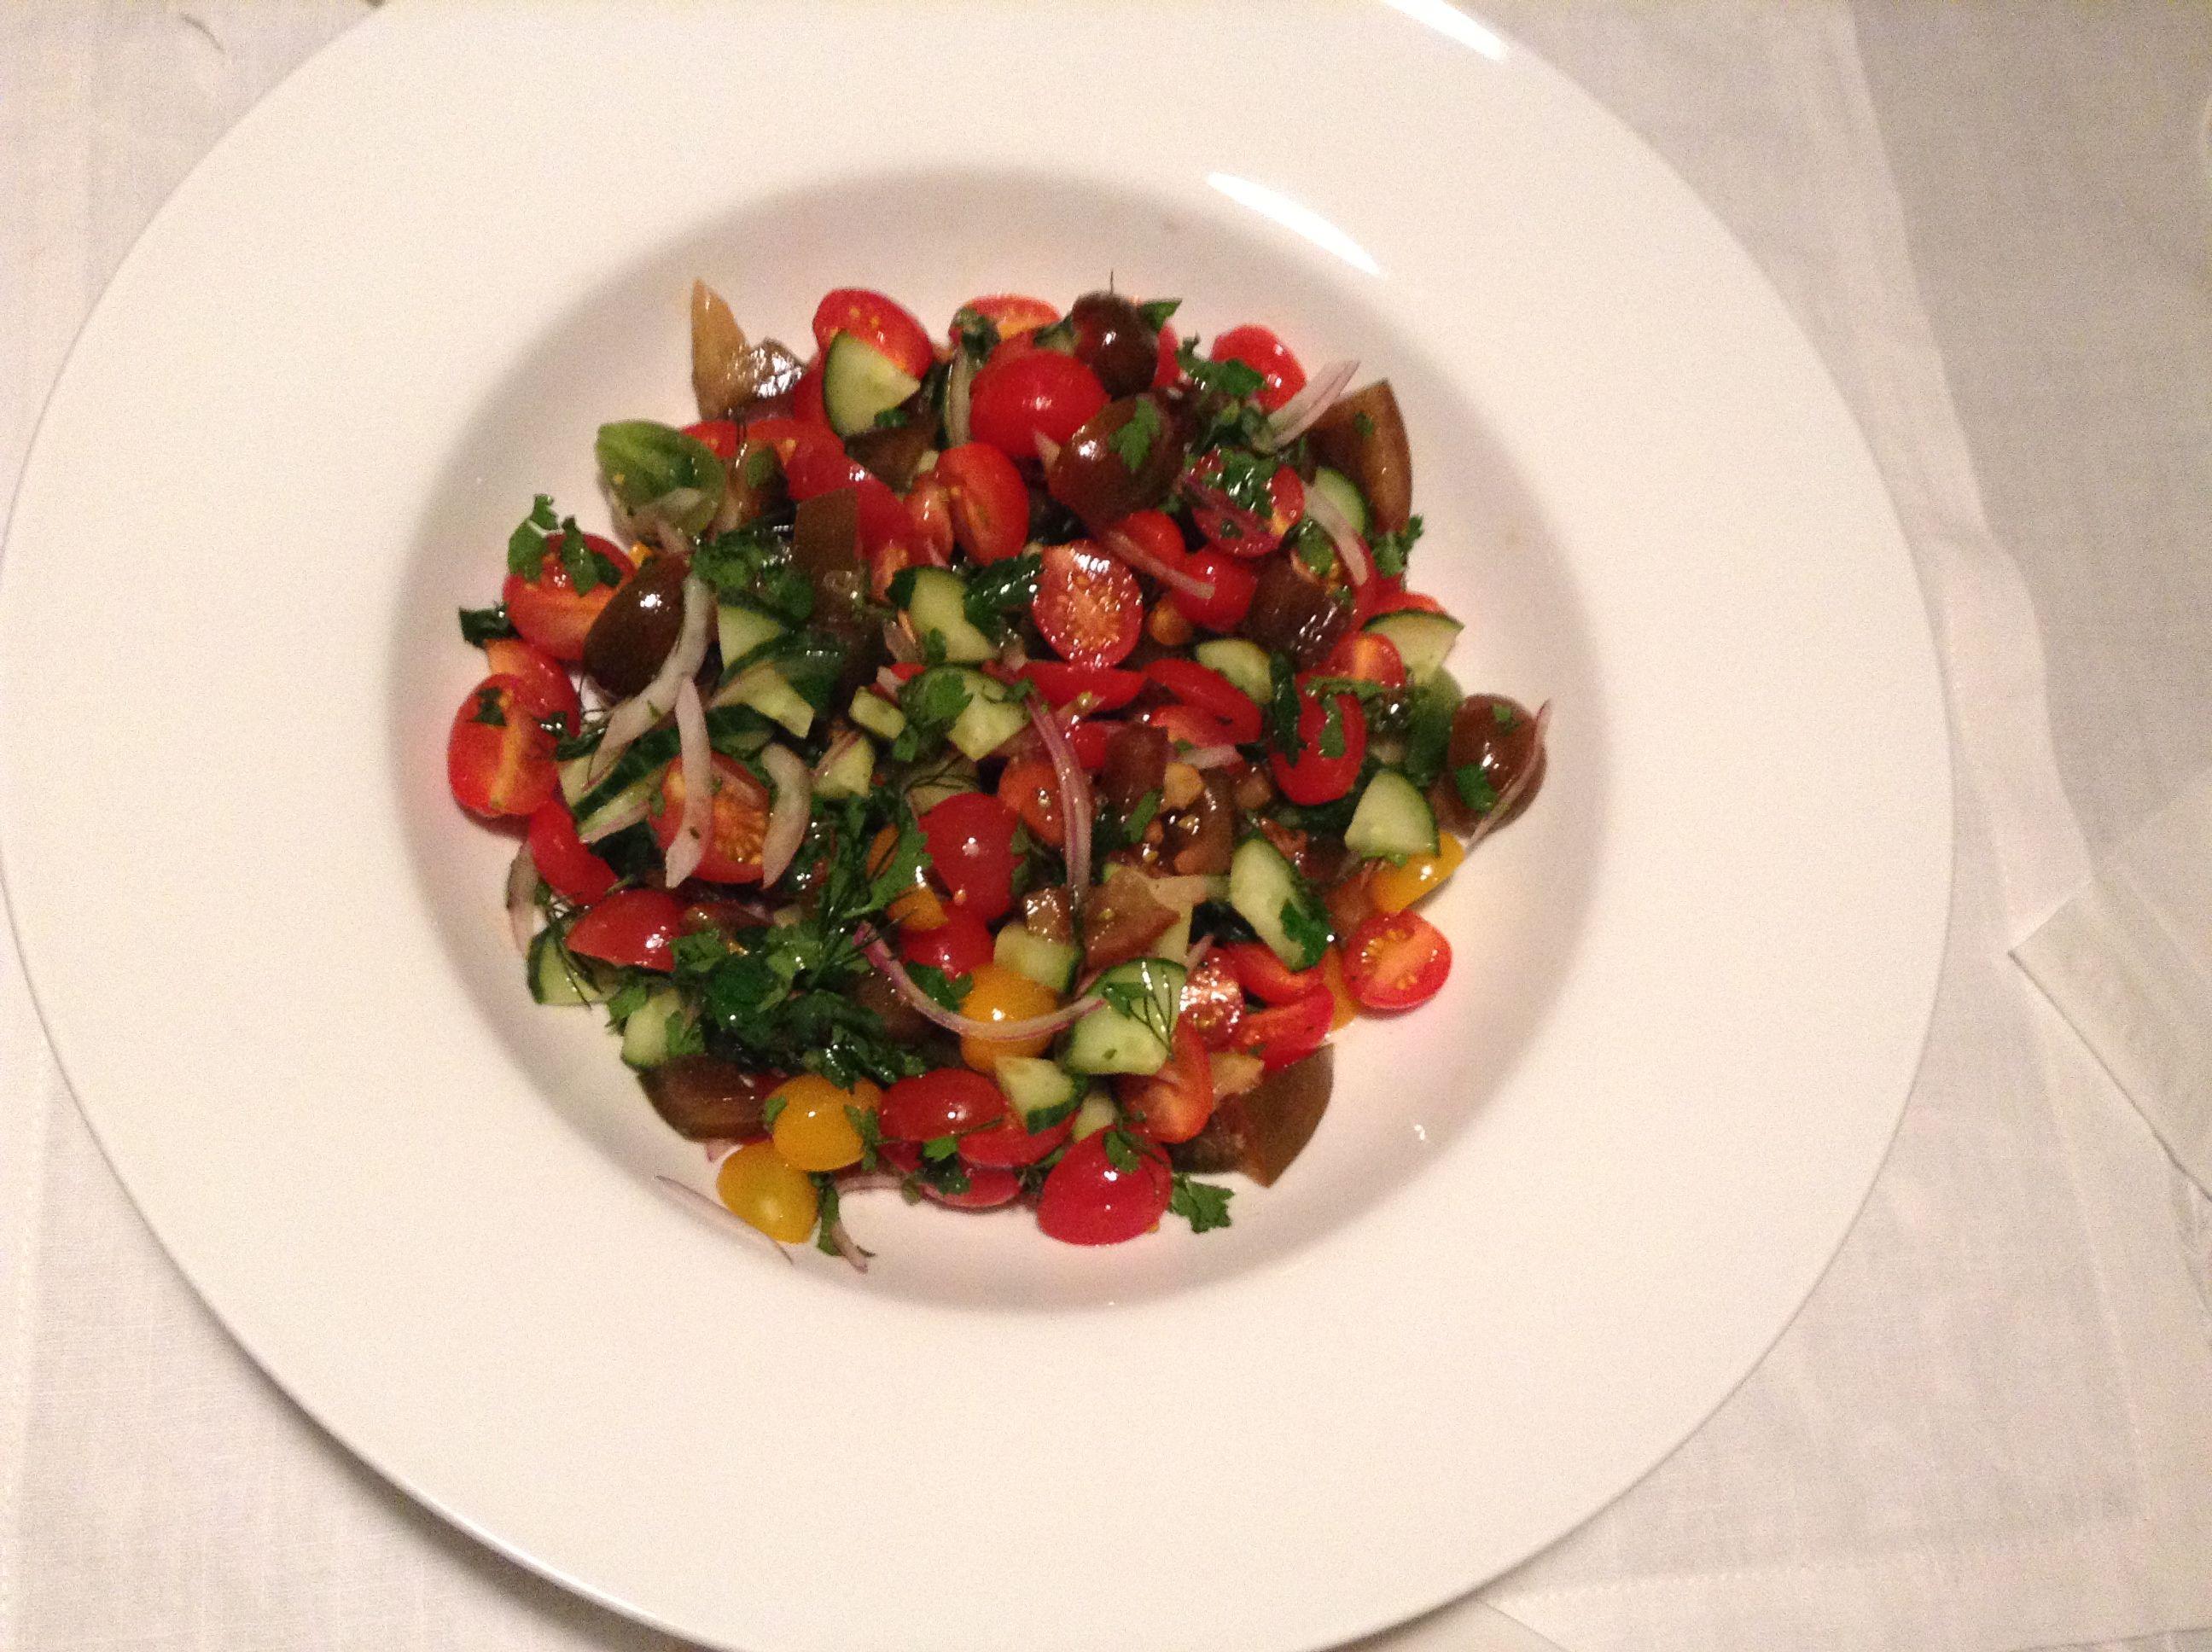 My tomato, cucumber and onion salad.